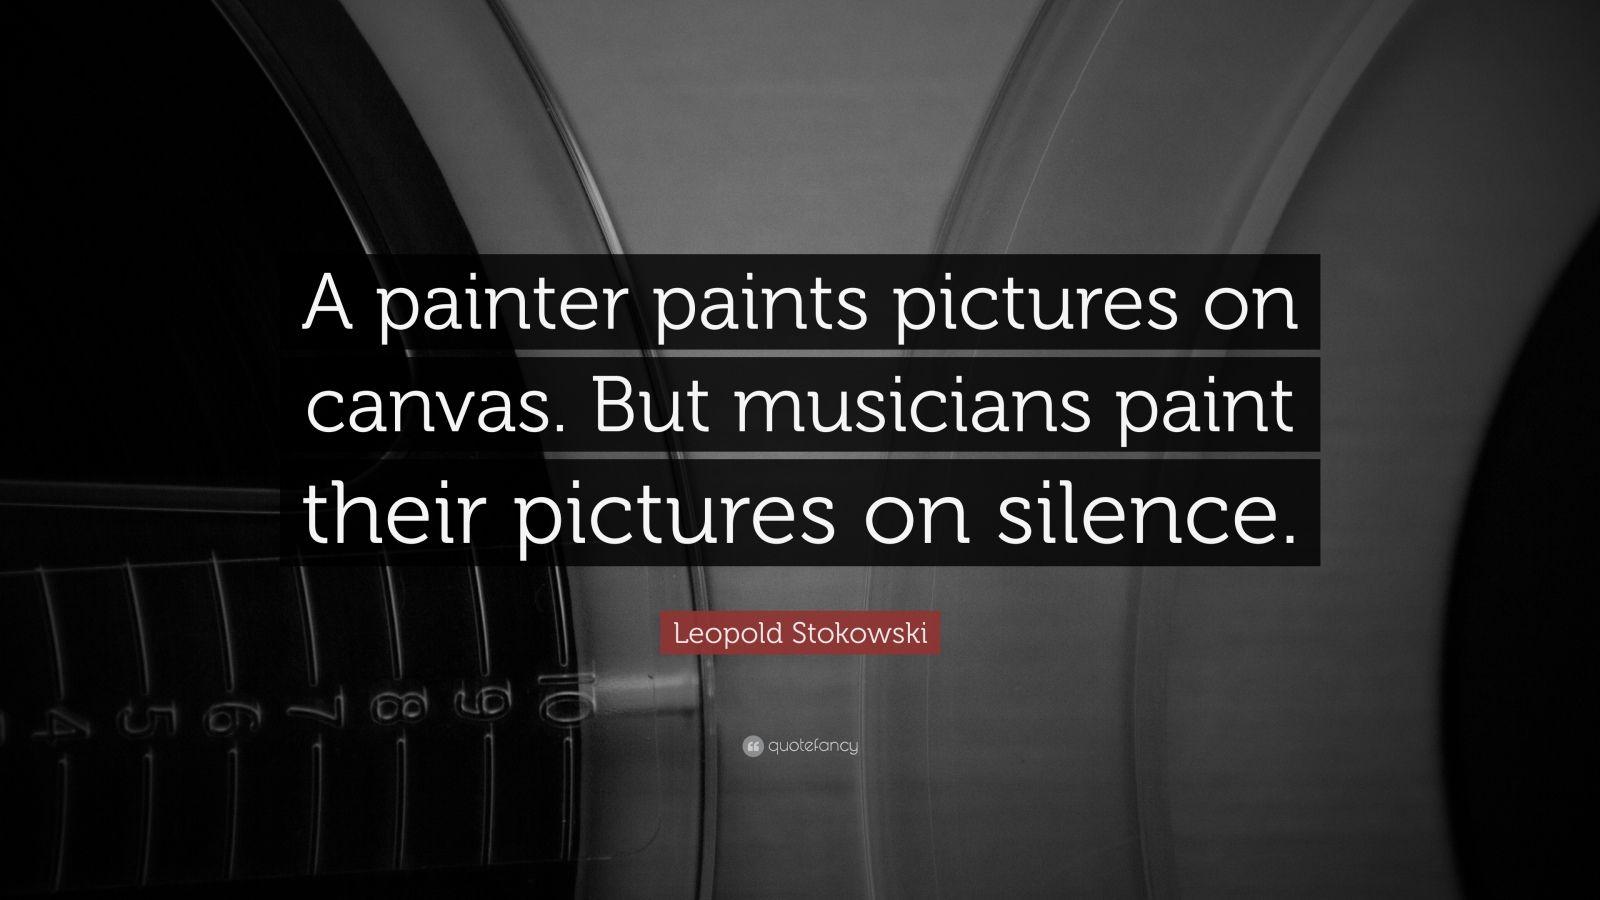 Roald Dahl Quotes Wallpaper Leopold Stokowski Quote A Painter Paints Pictures On